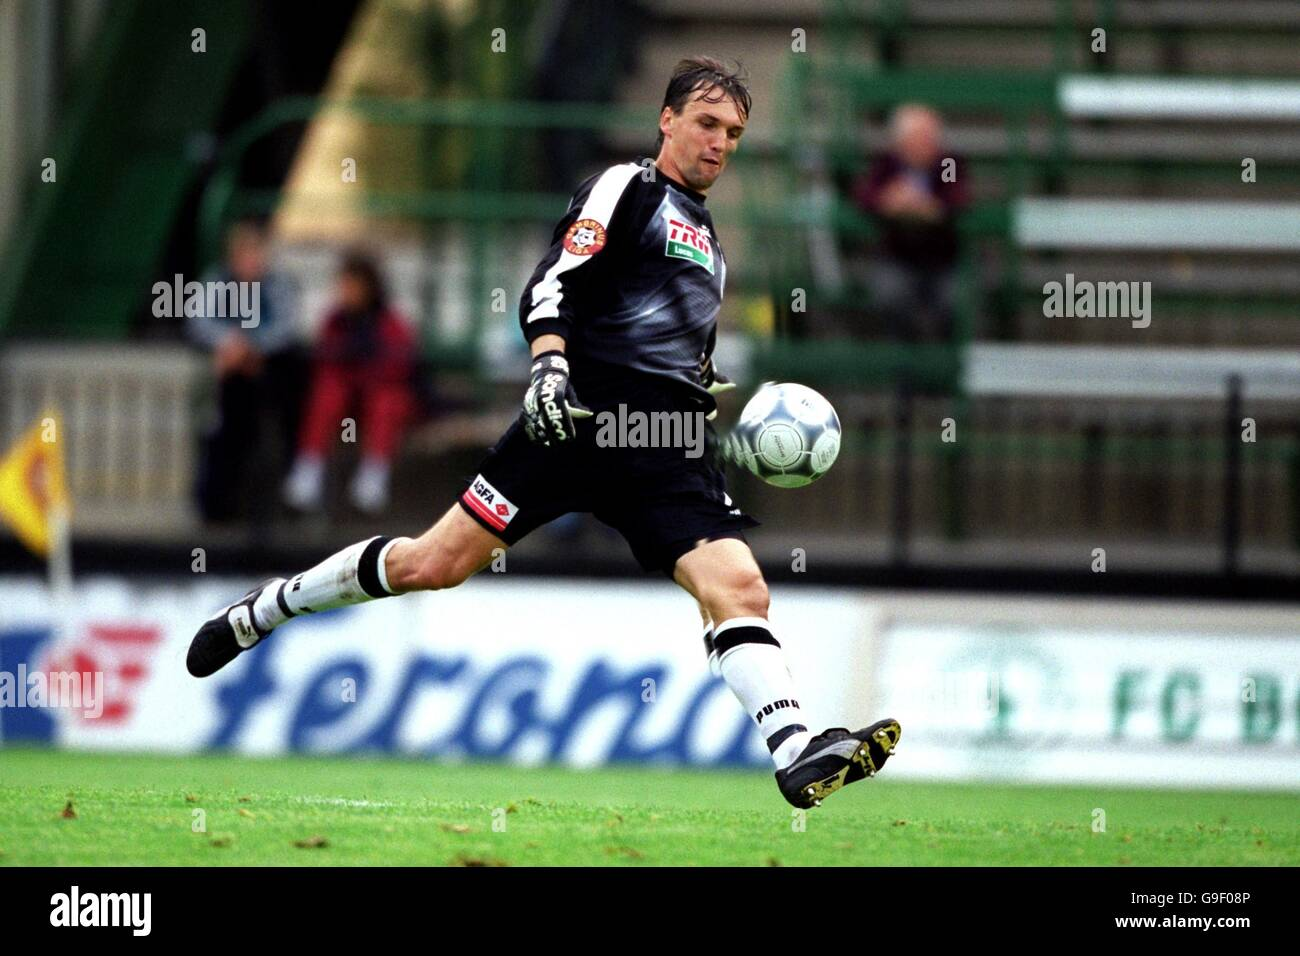 Tschechische FuГџball Liga